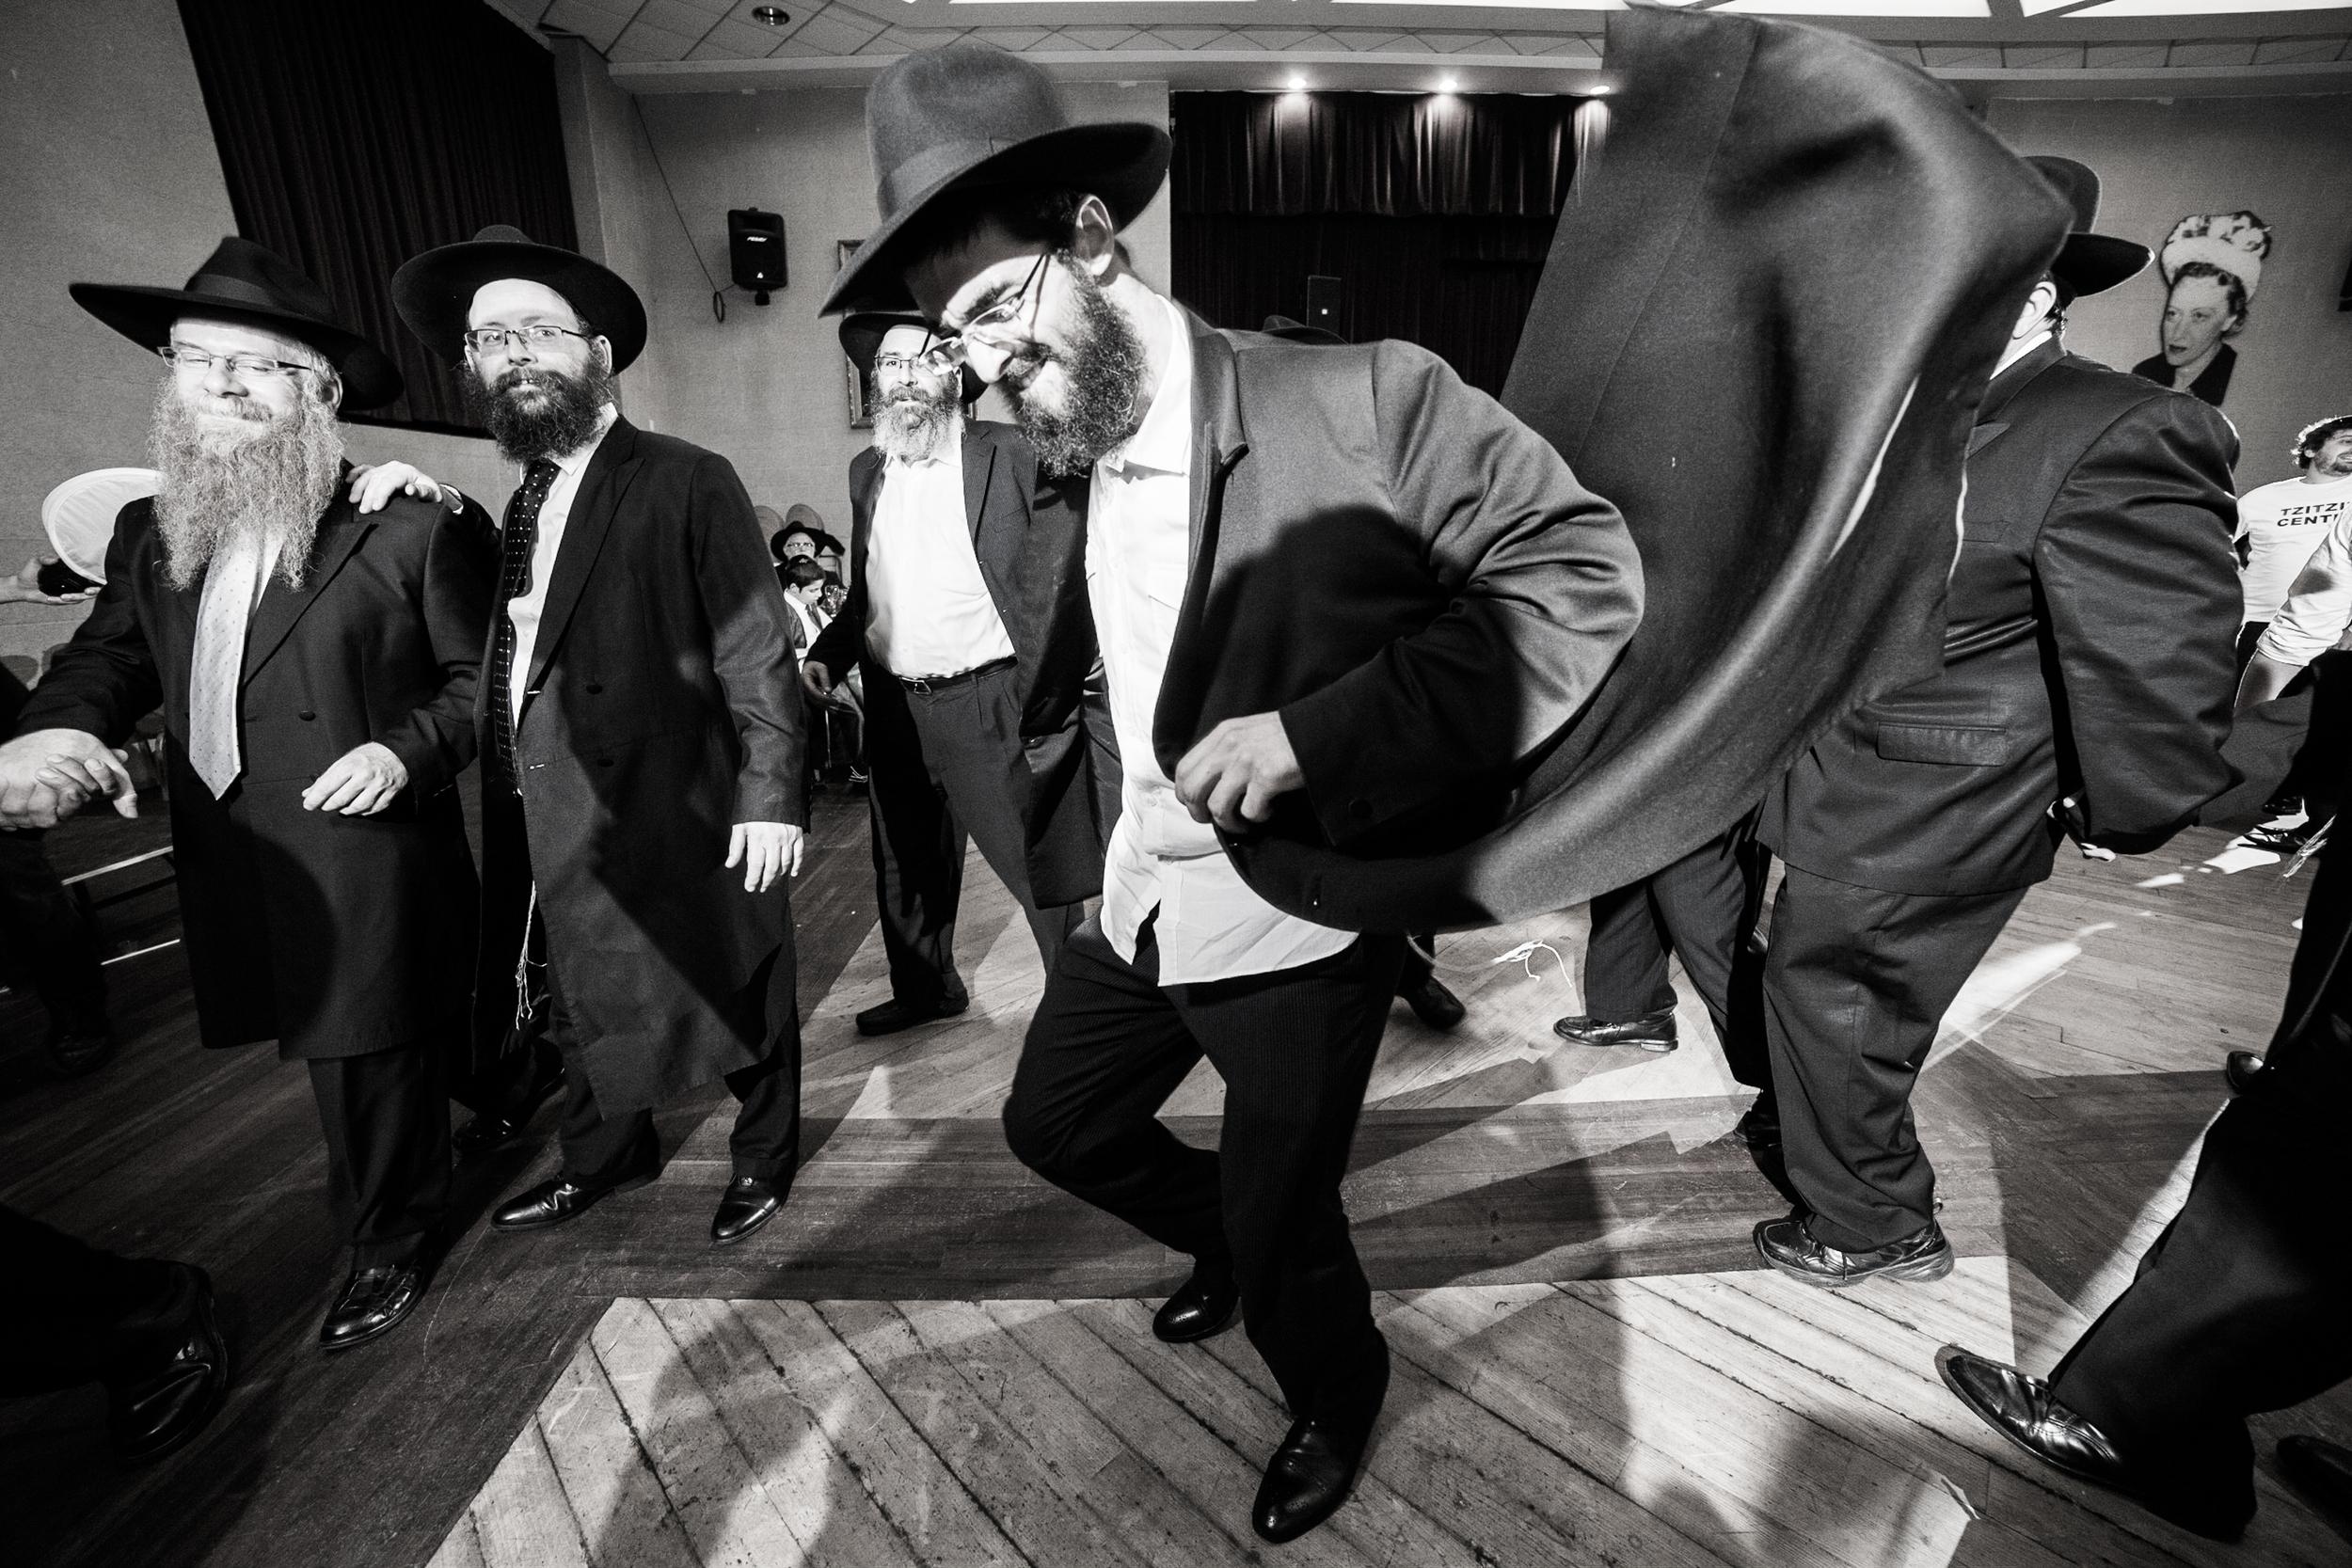 Wedding Iossi and Gitty Khafif  - Eliau Piha studio photography, new york, events, people 770 brooklyn -0965.jpg